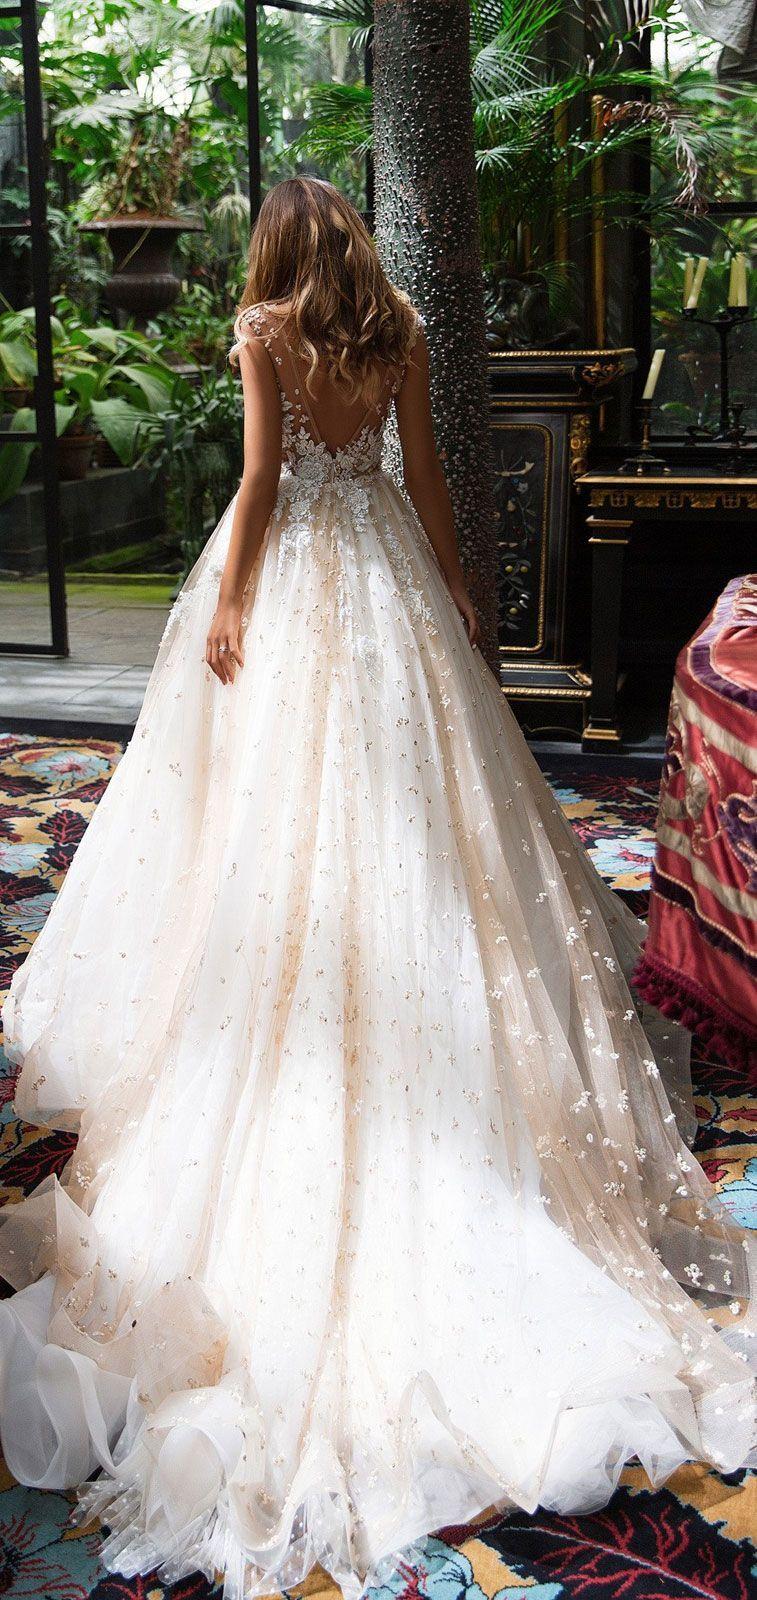 Milla nova wedding dress inspiration my dream wedding pinterest